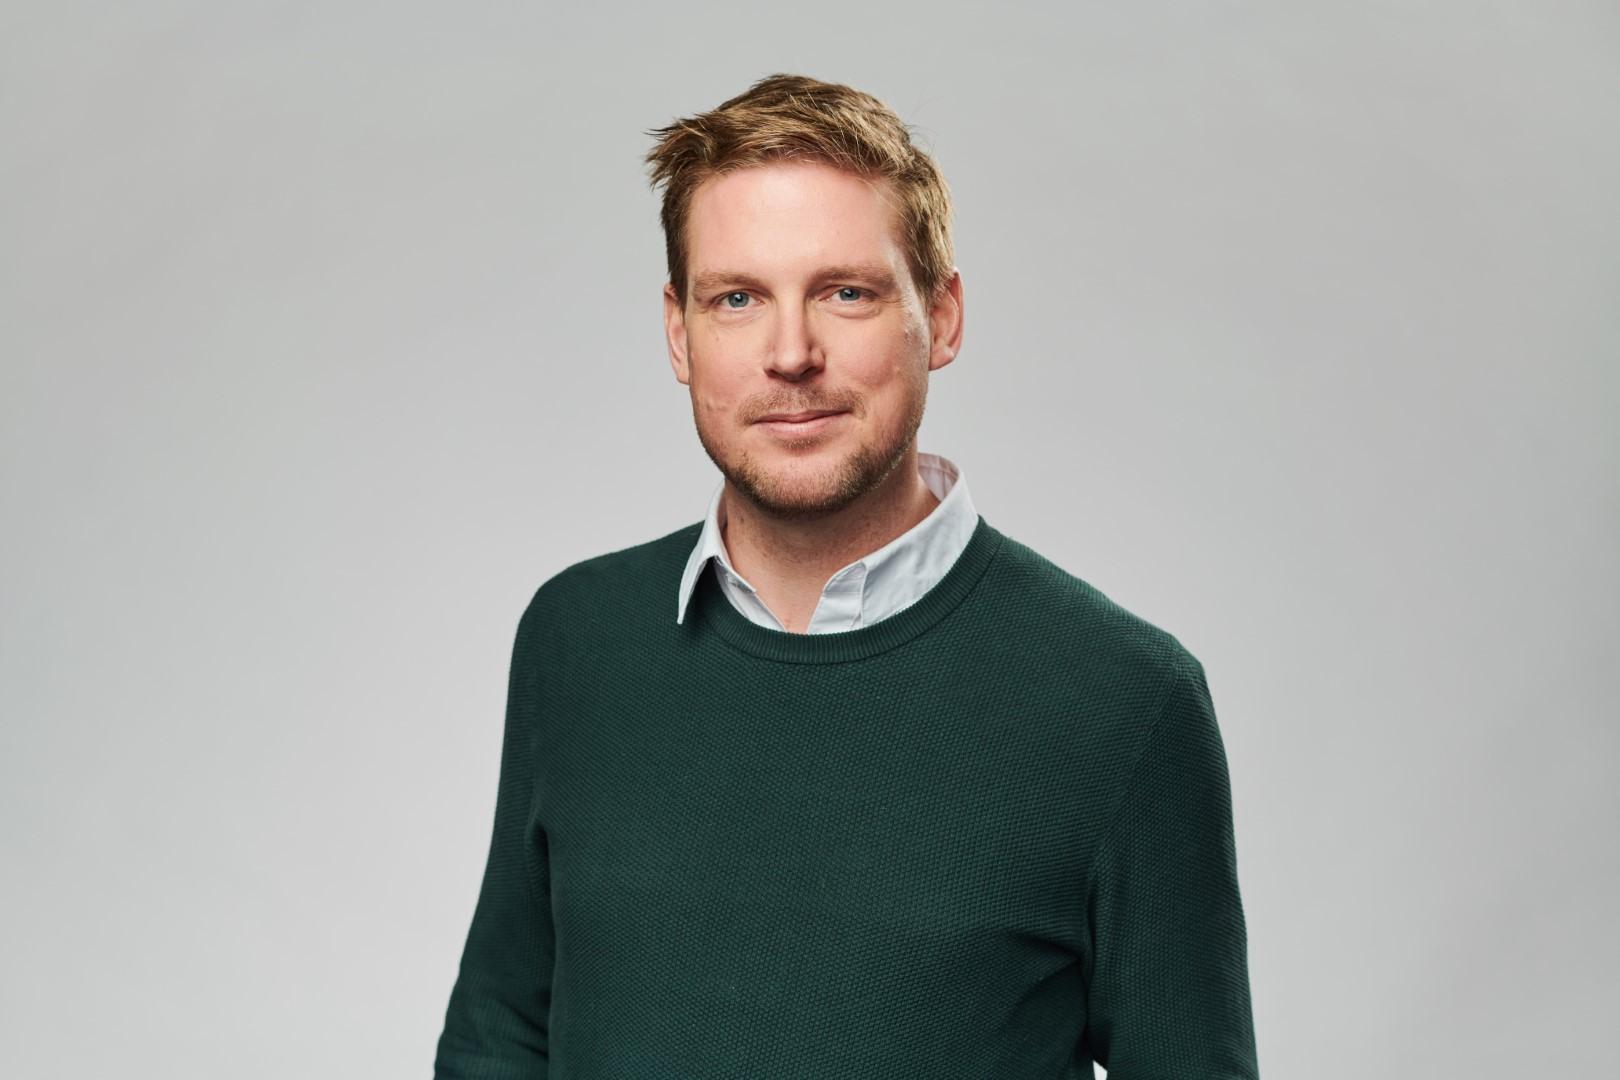 Erik Hogeboom